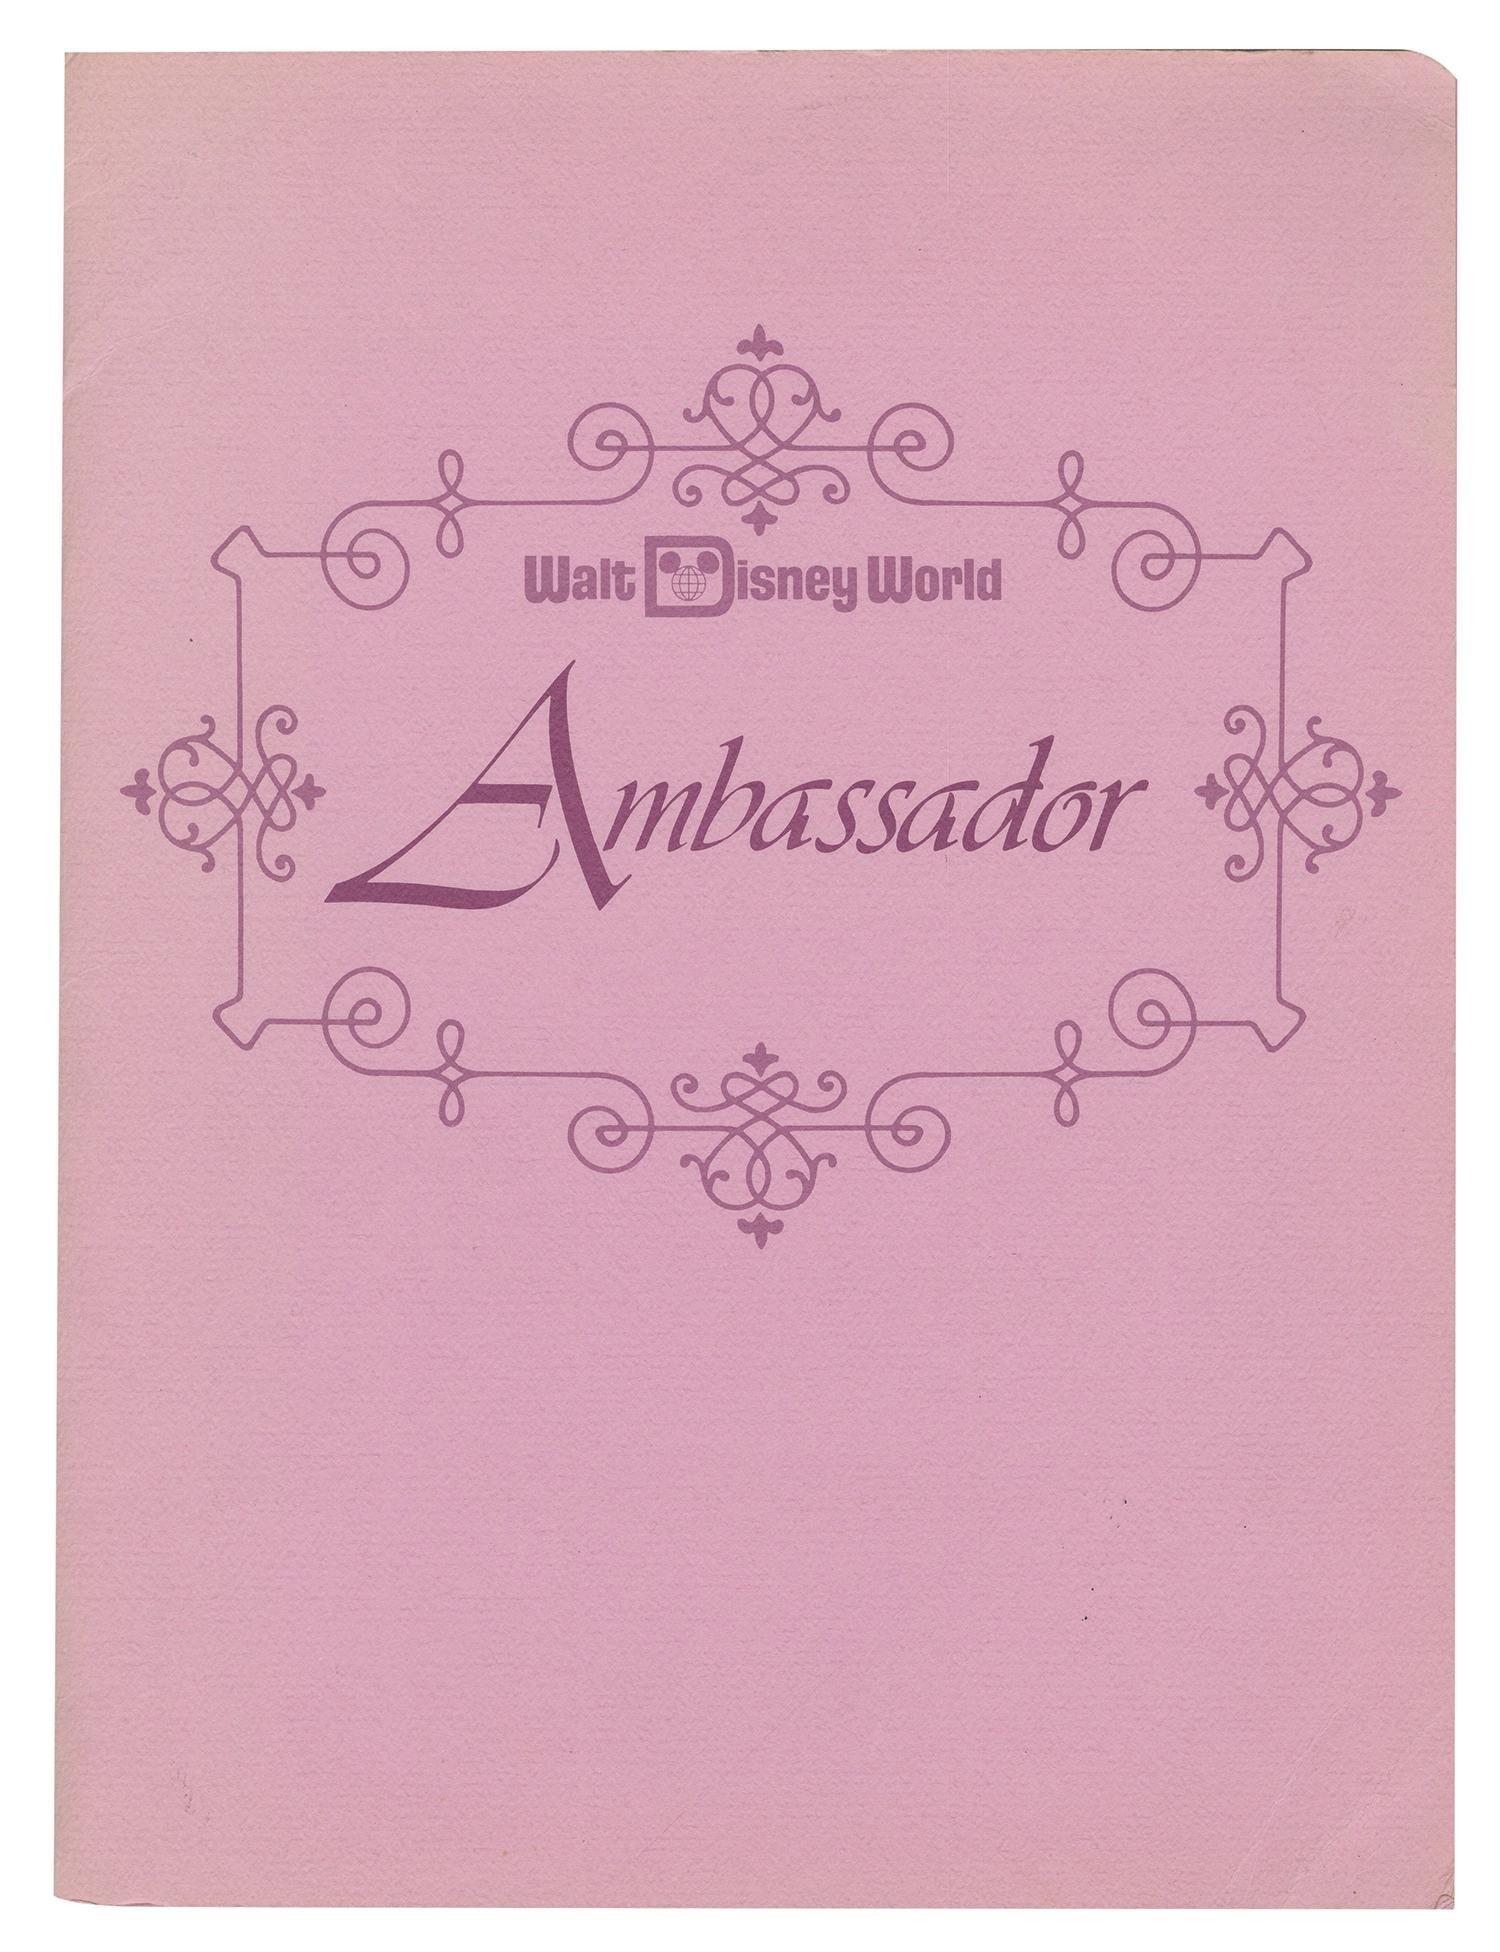 Walt Disney World Press Packet.